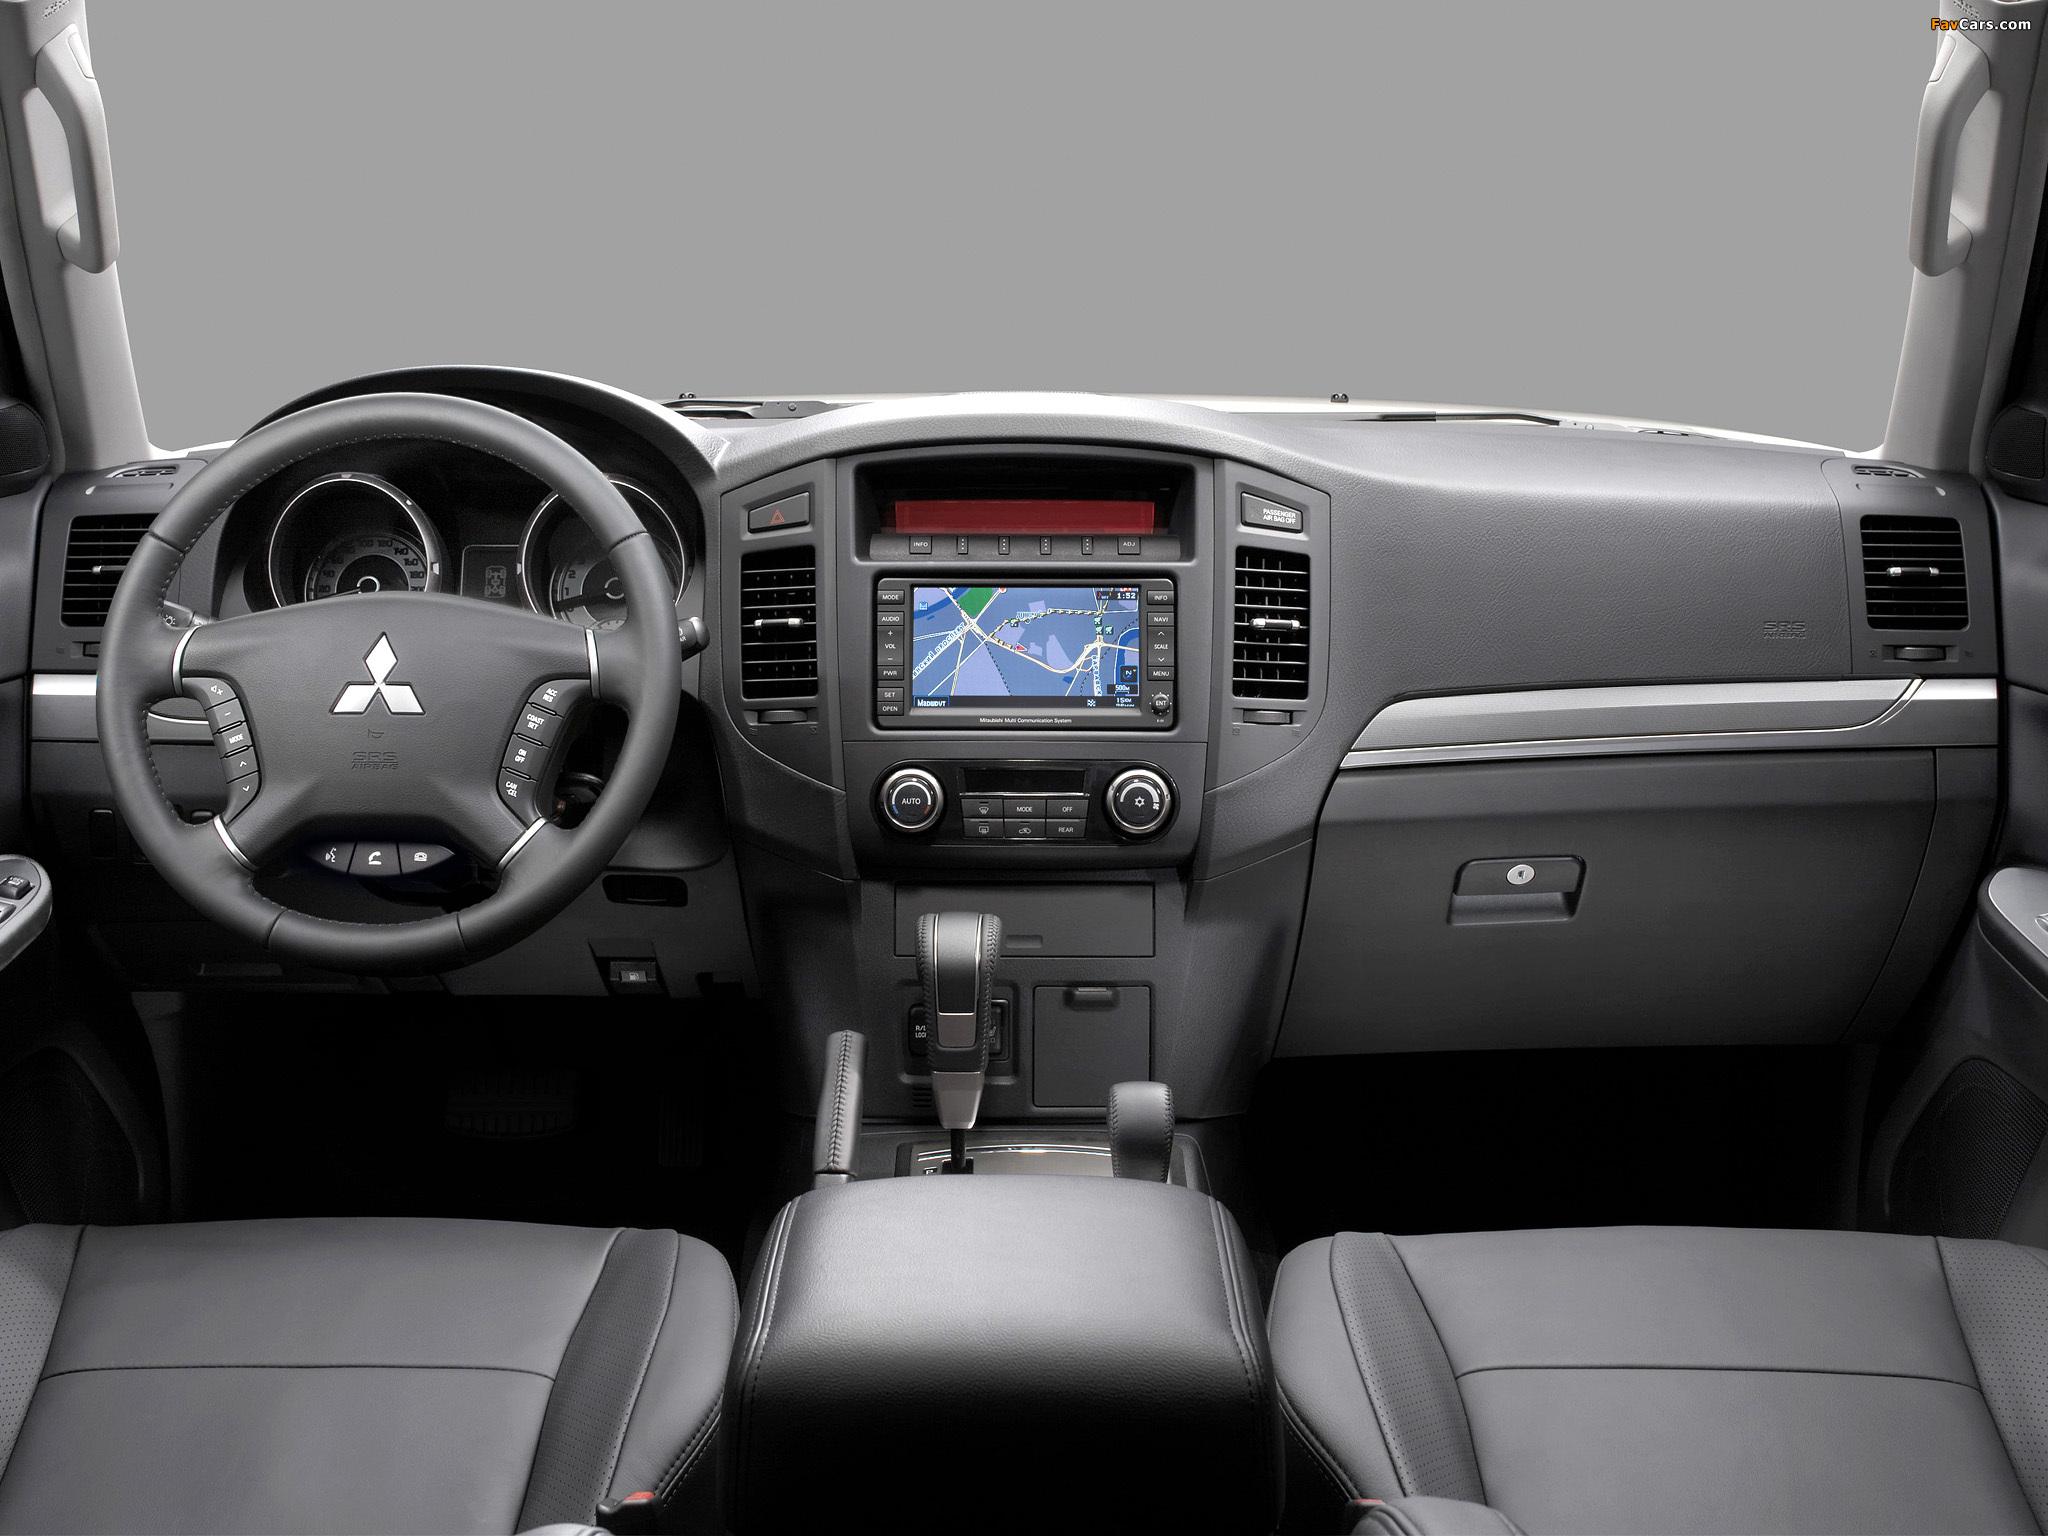 Mitsubishi Pajero 5-door 2011 photos (2048 x 1536)